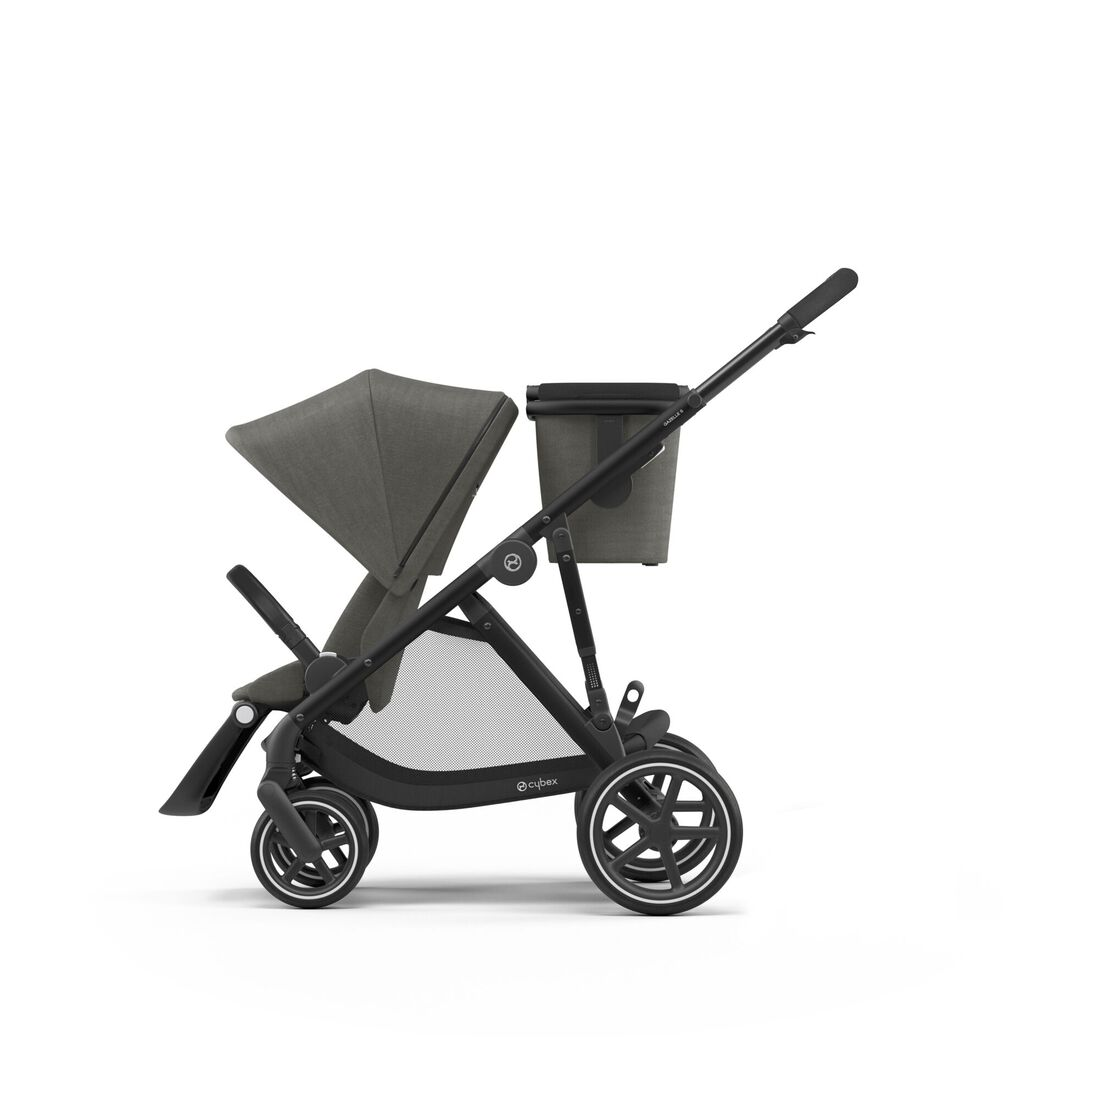 CYBEX Gazelle S - Soho Grey (Schwarzer Rahmen) in Soho Grey (Black Frame) large Bild 1